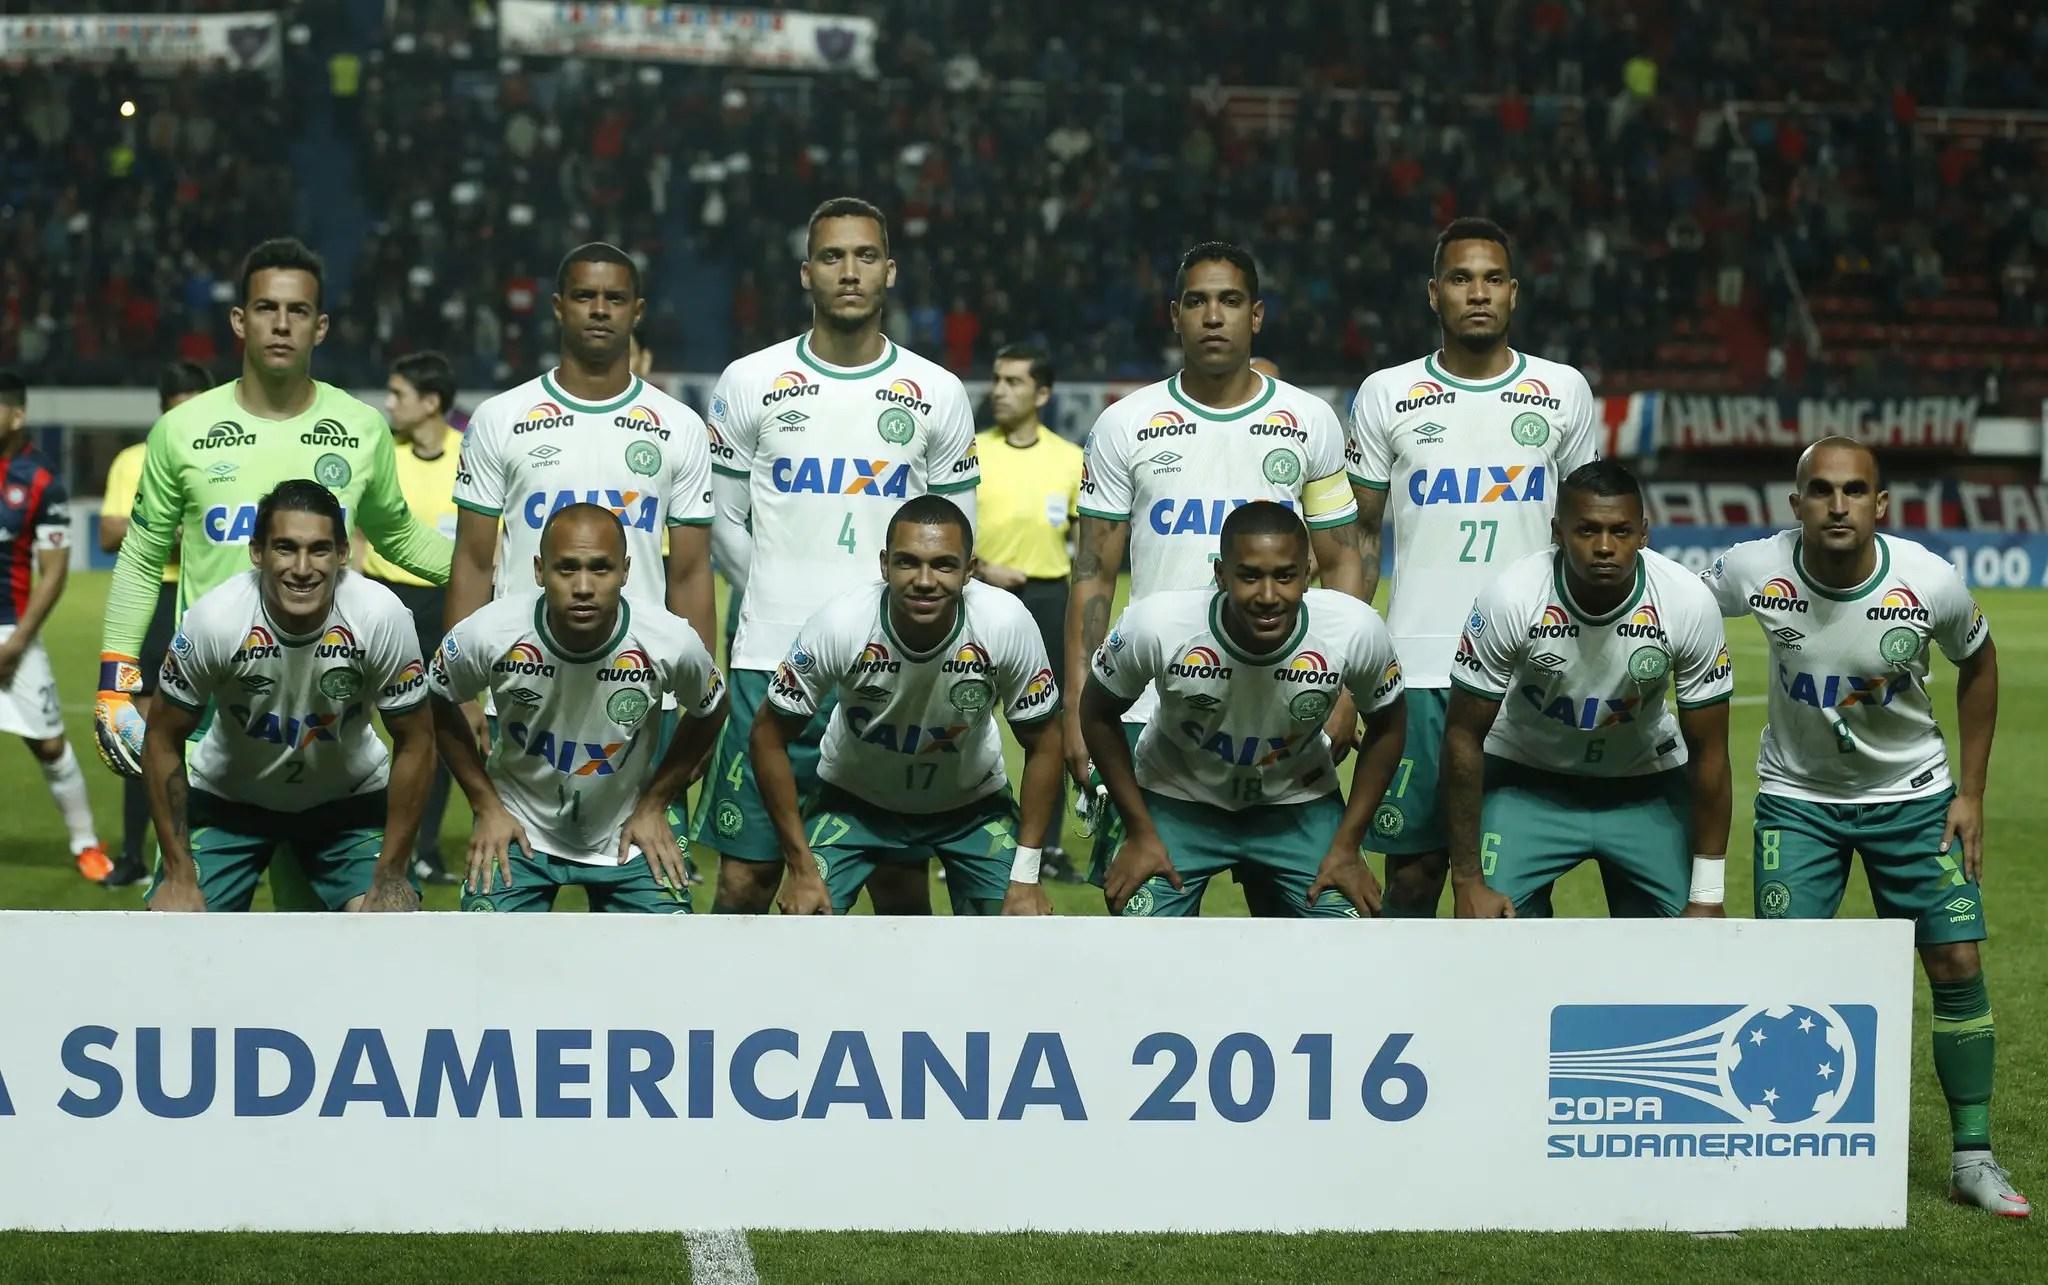 Chapecoense Declared Copa Sudamericana Champions After Plane Crash